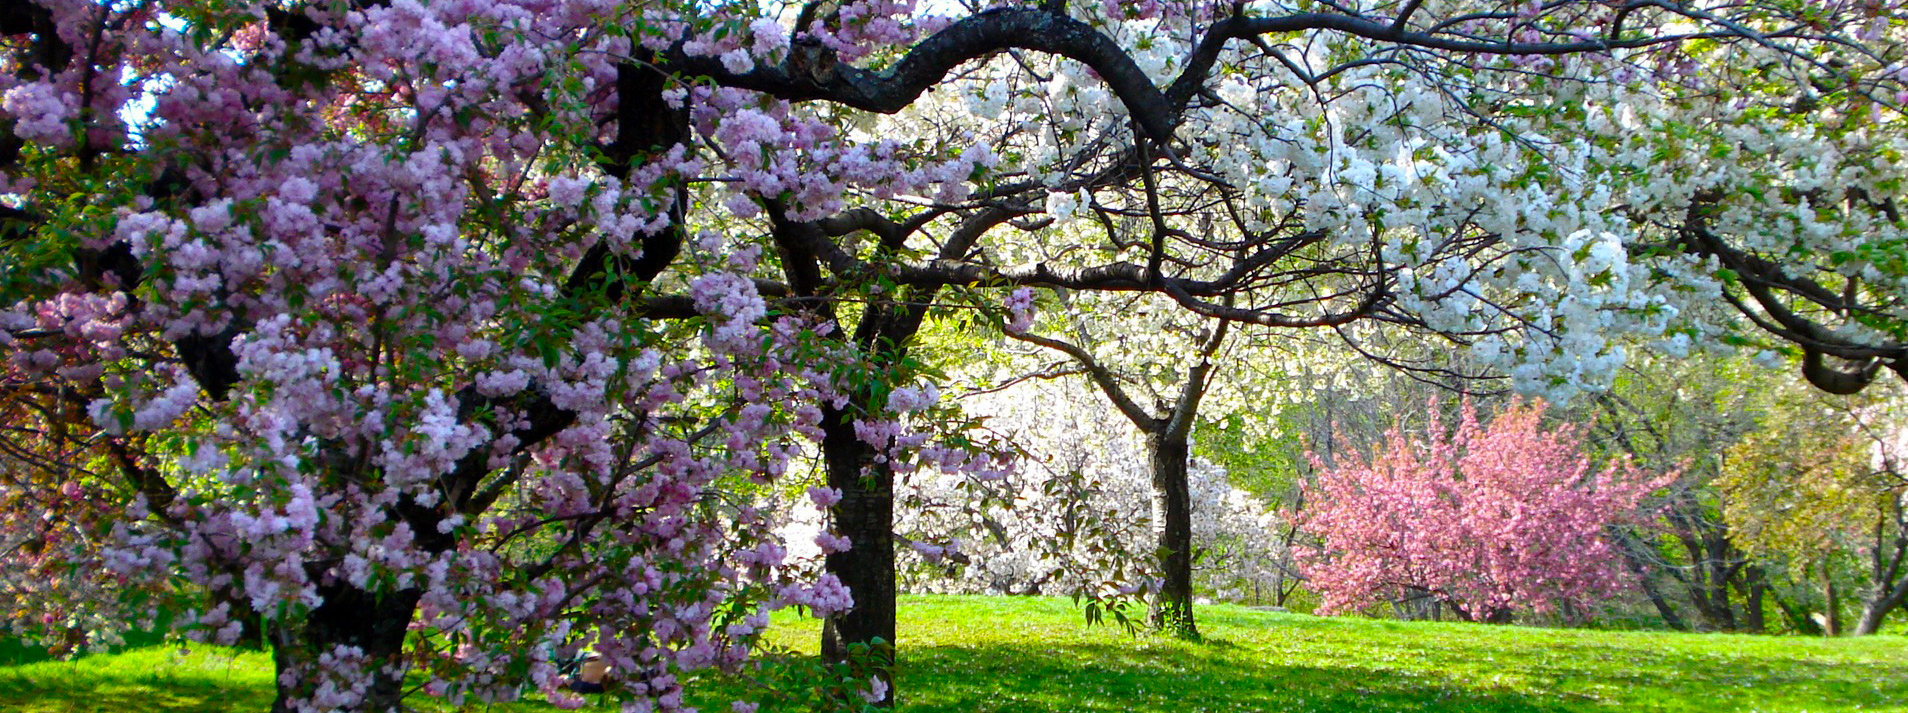 Locations irt photography - New york botanical garden parking ...